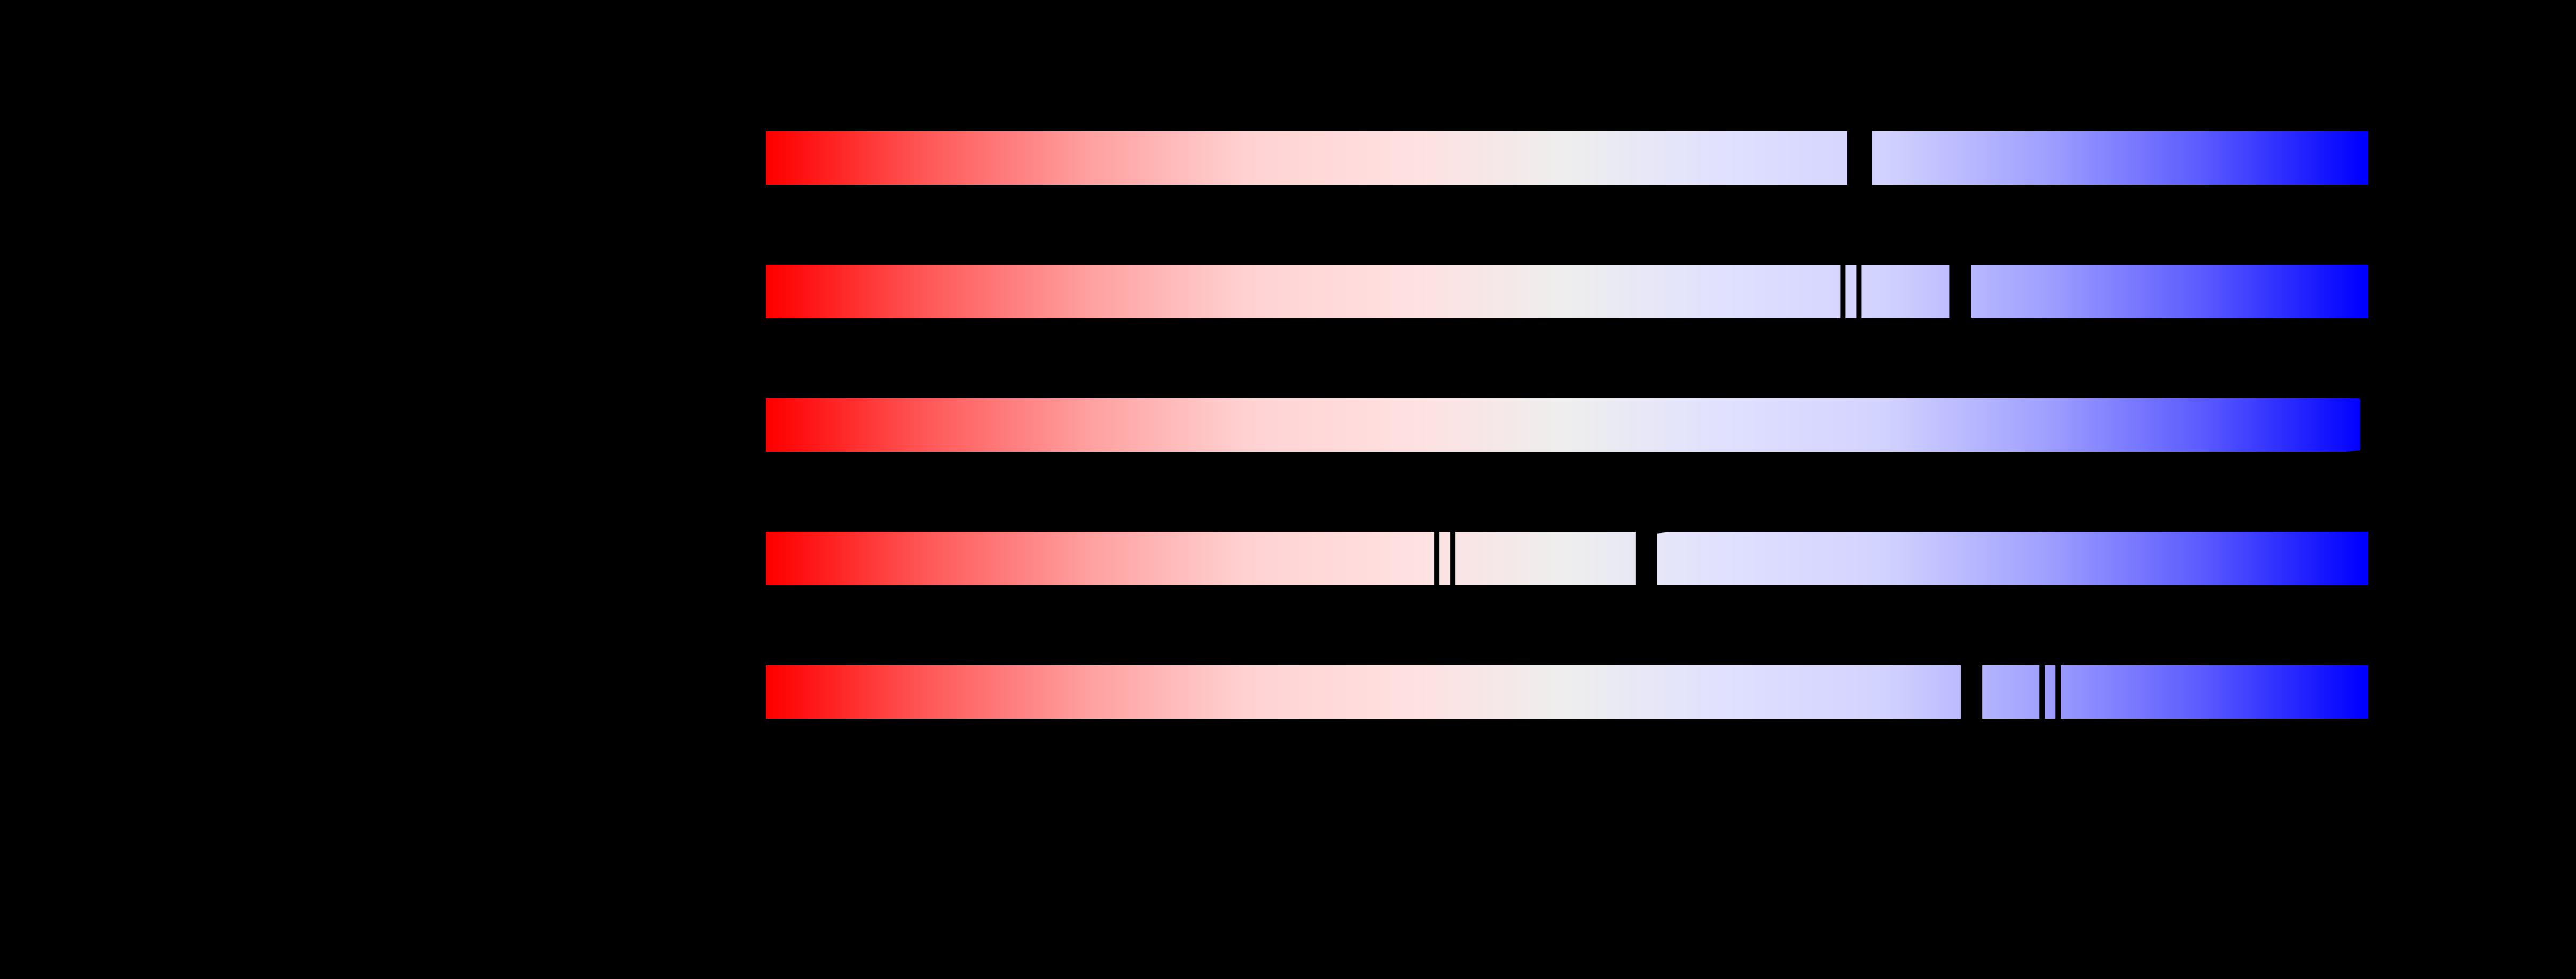 chromoshadow domain - oi